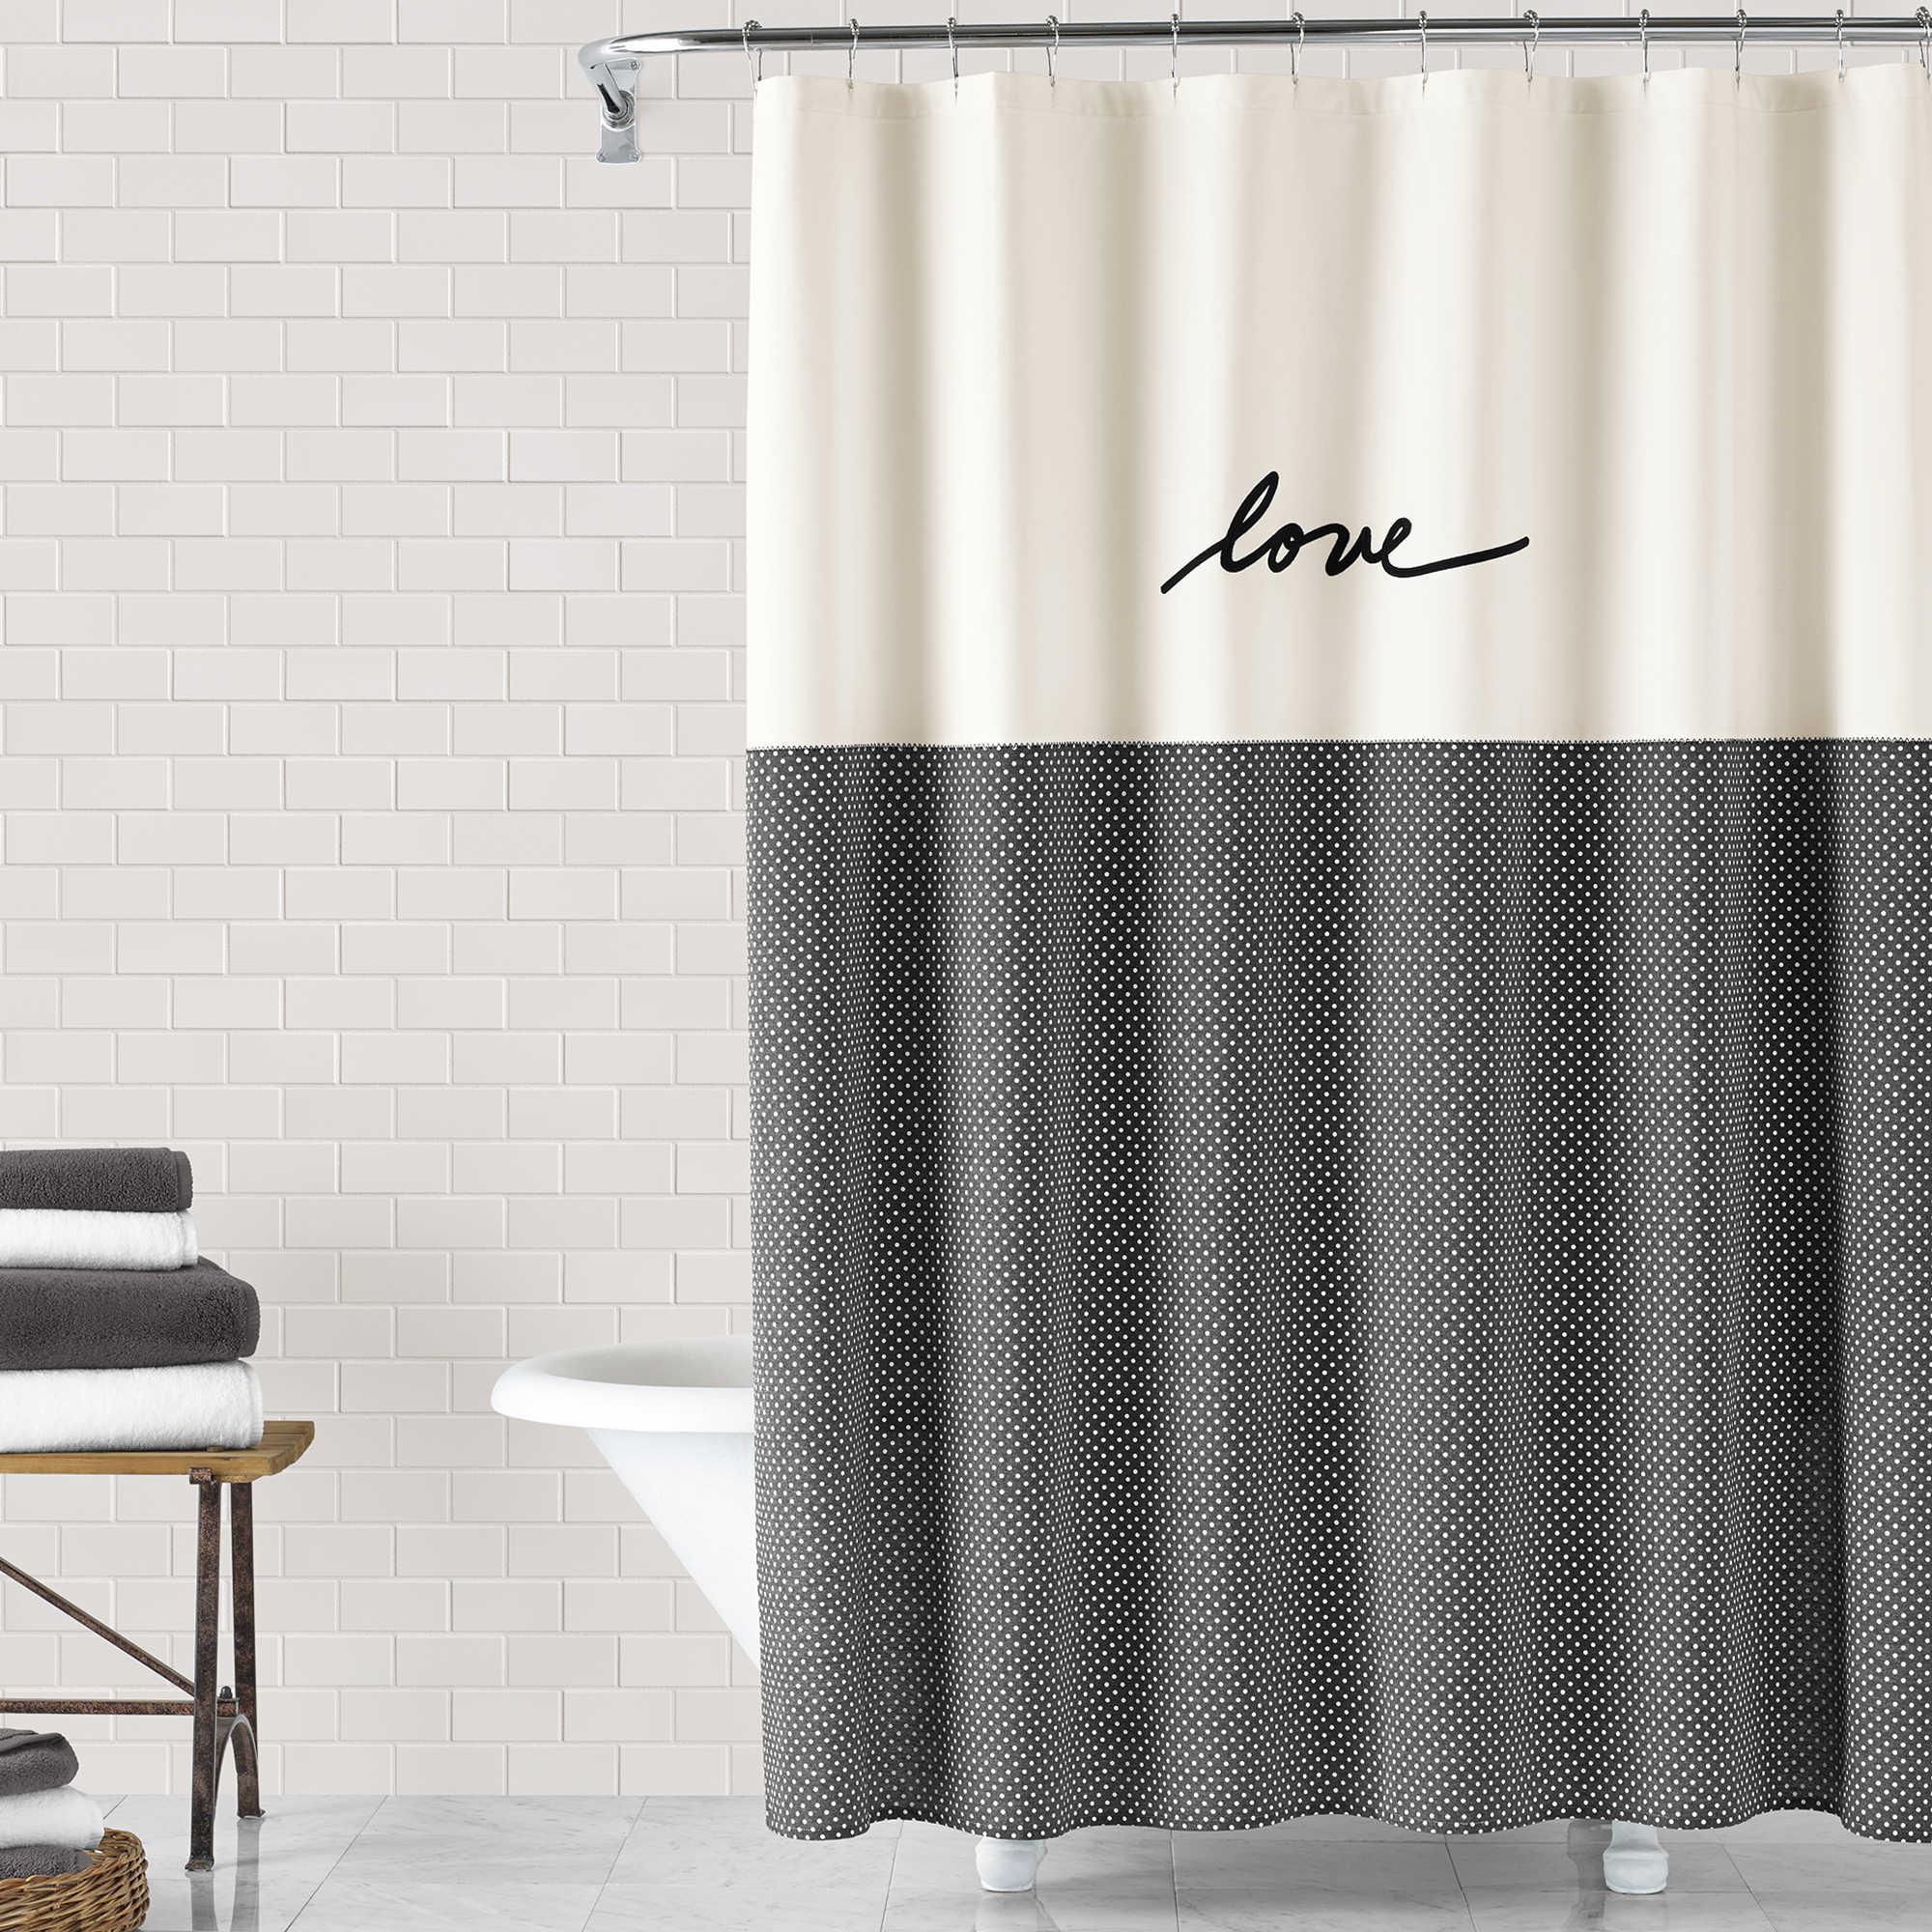 Bathroom Shower Ideas: Shower Curtains, Rods - Bed Bath & Beyond